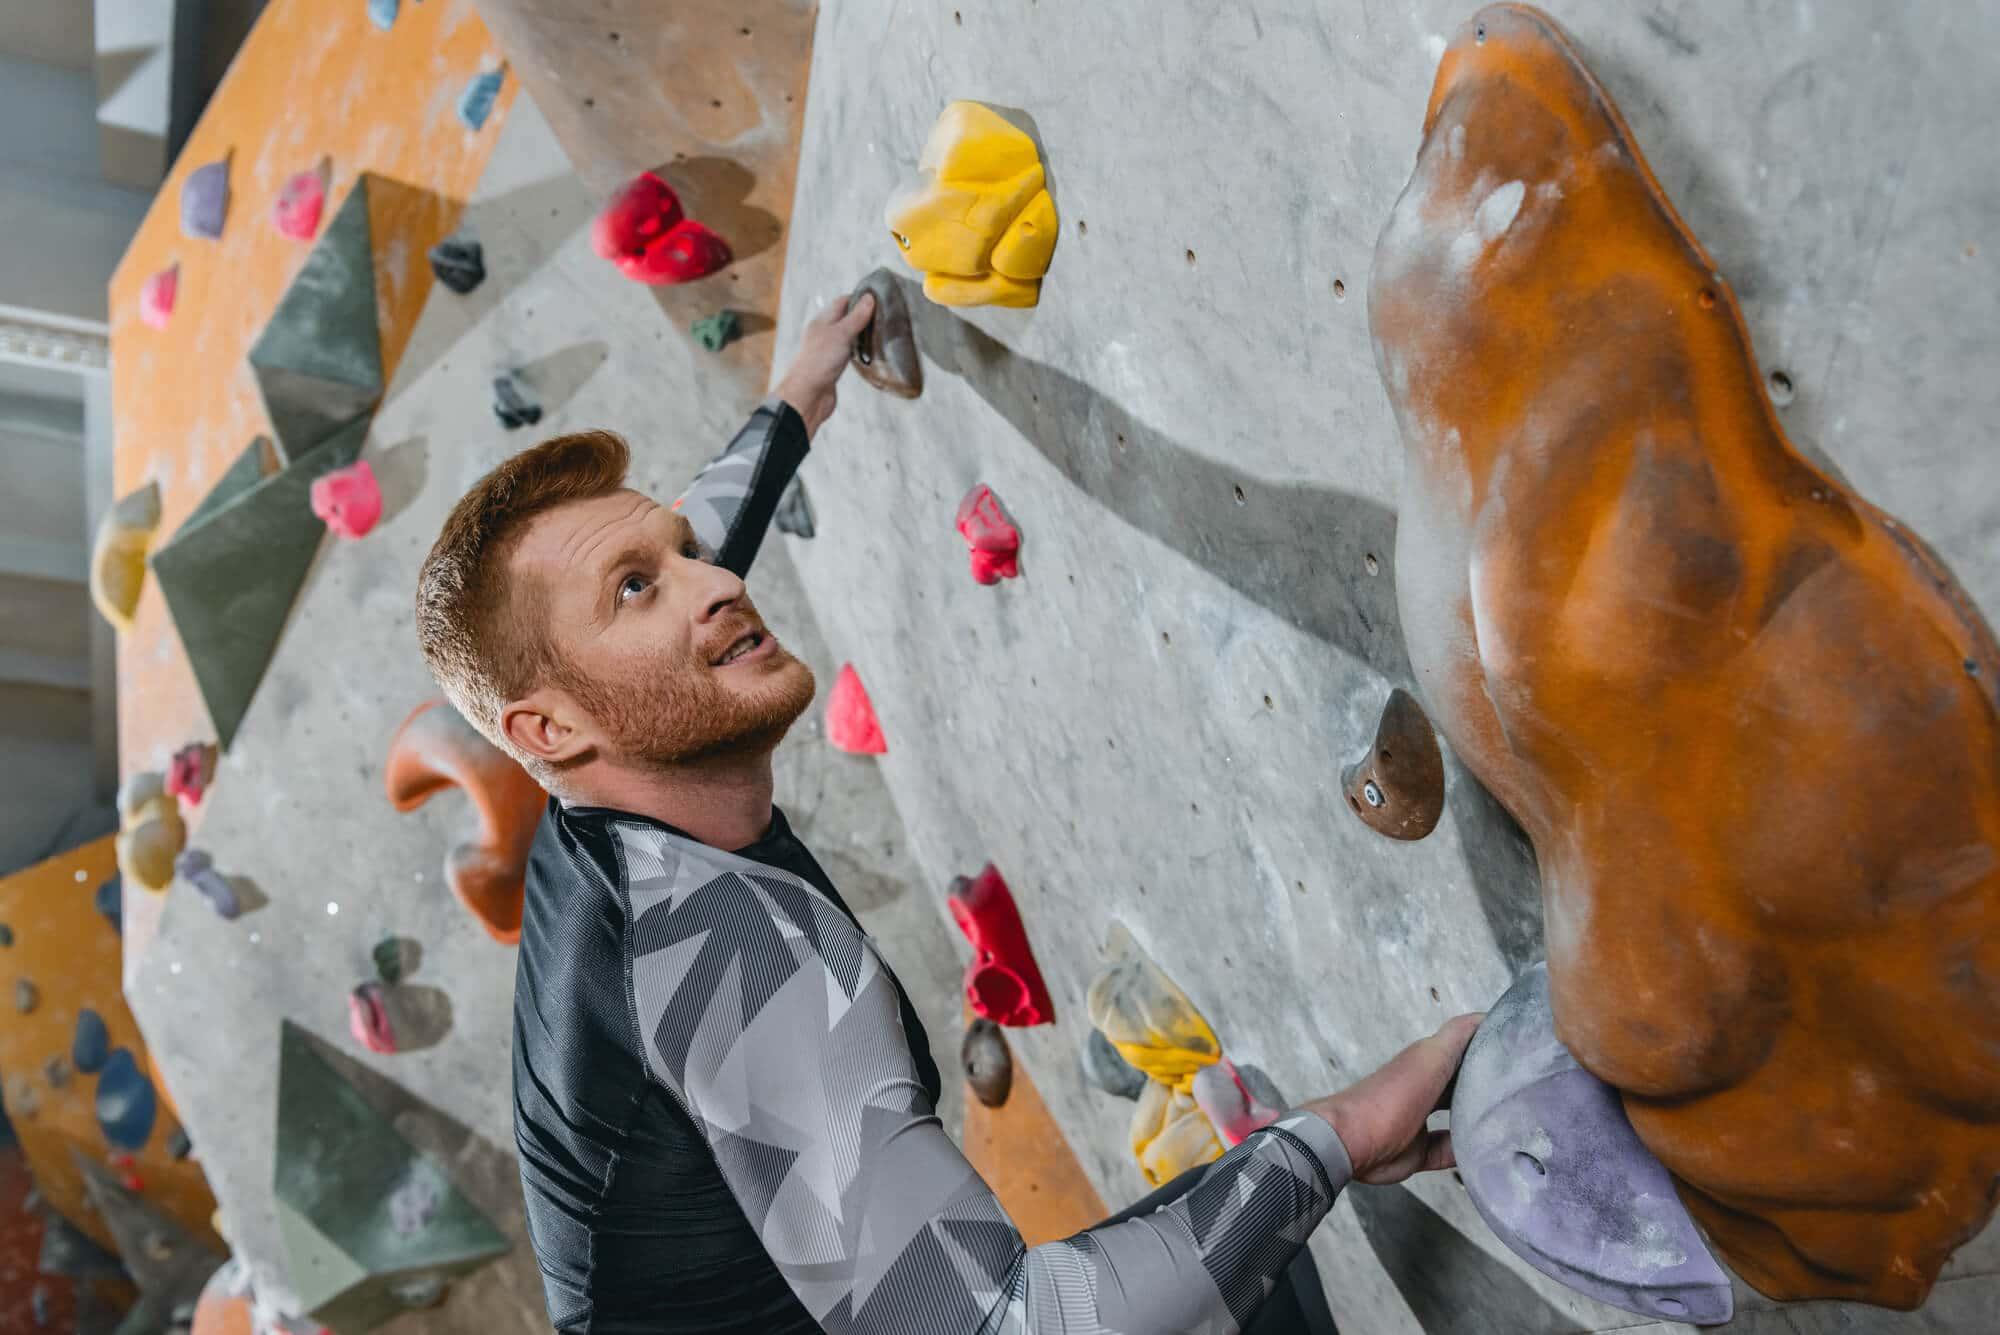 climbing grip strength - Fitness Expo